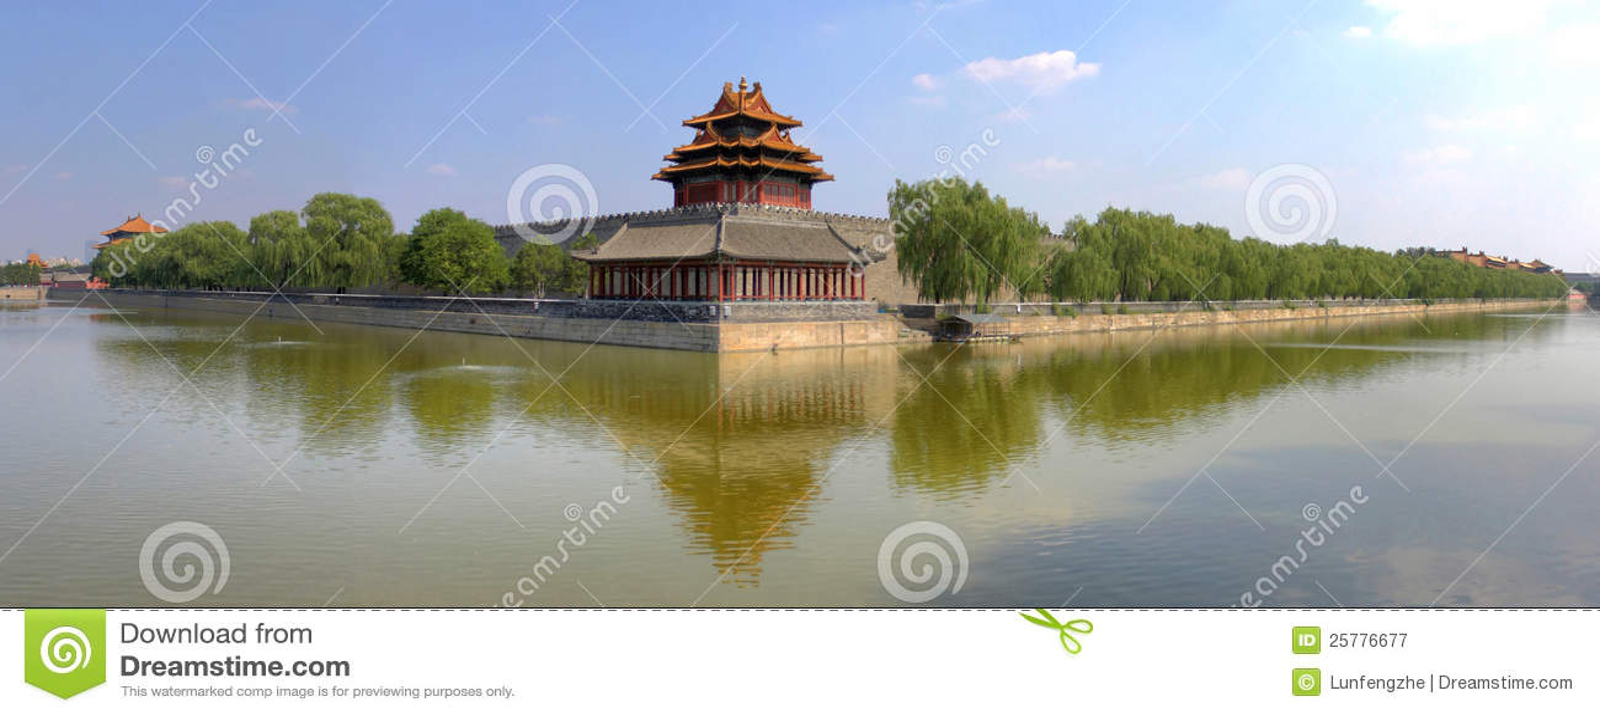 Download Forbidden City, Turret, Beijing, China Stock Image - Image of history, emperor: 25776677